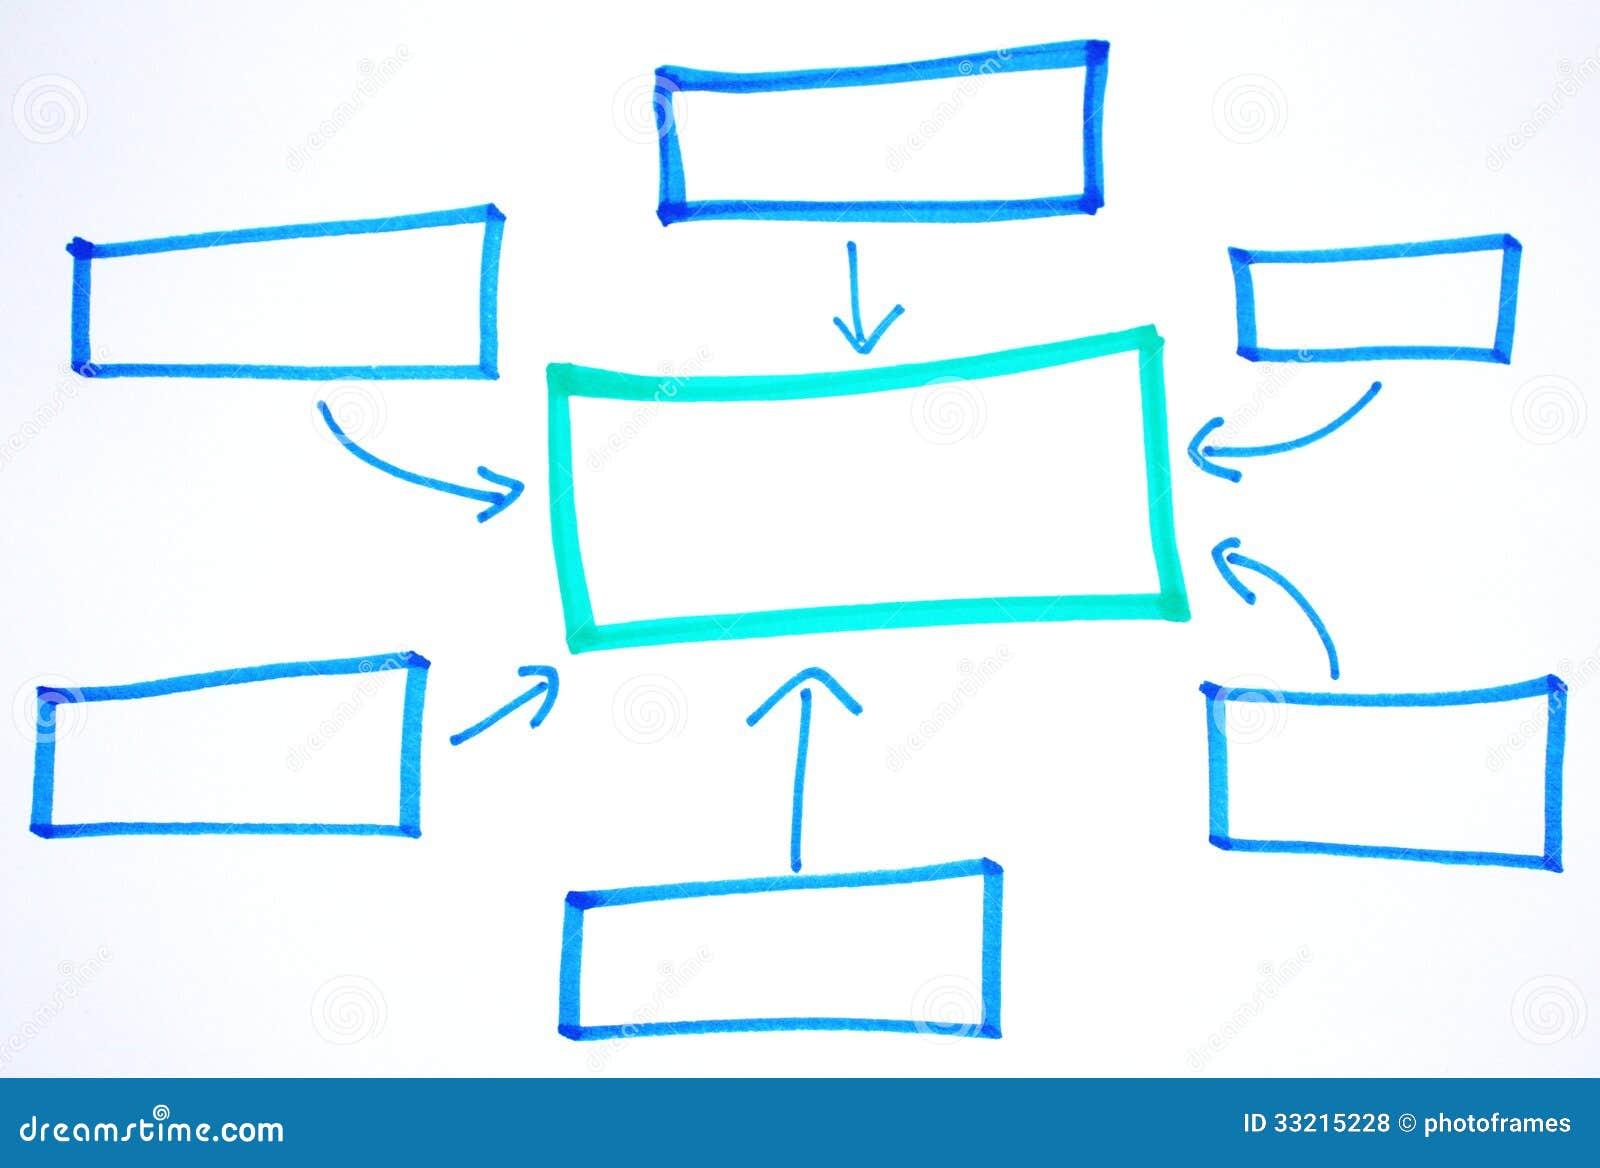 blank flow chart template